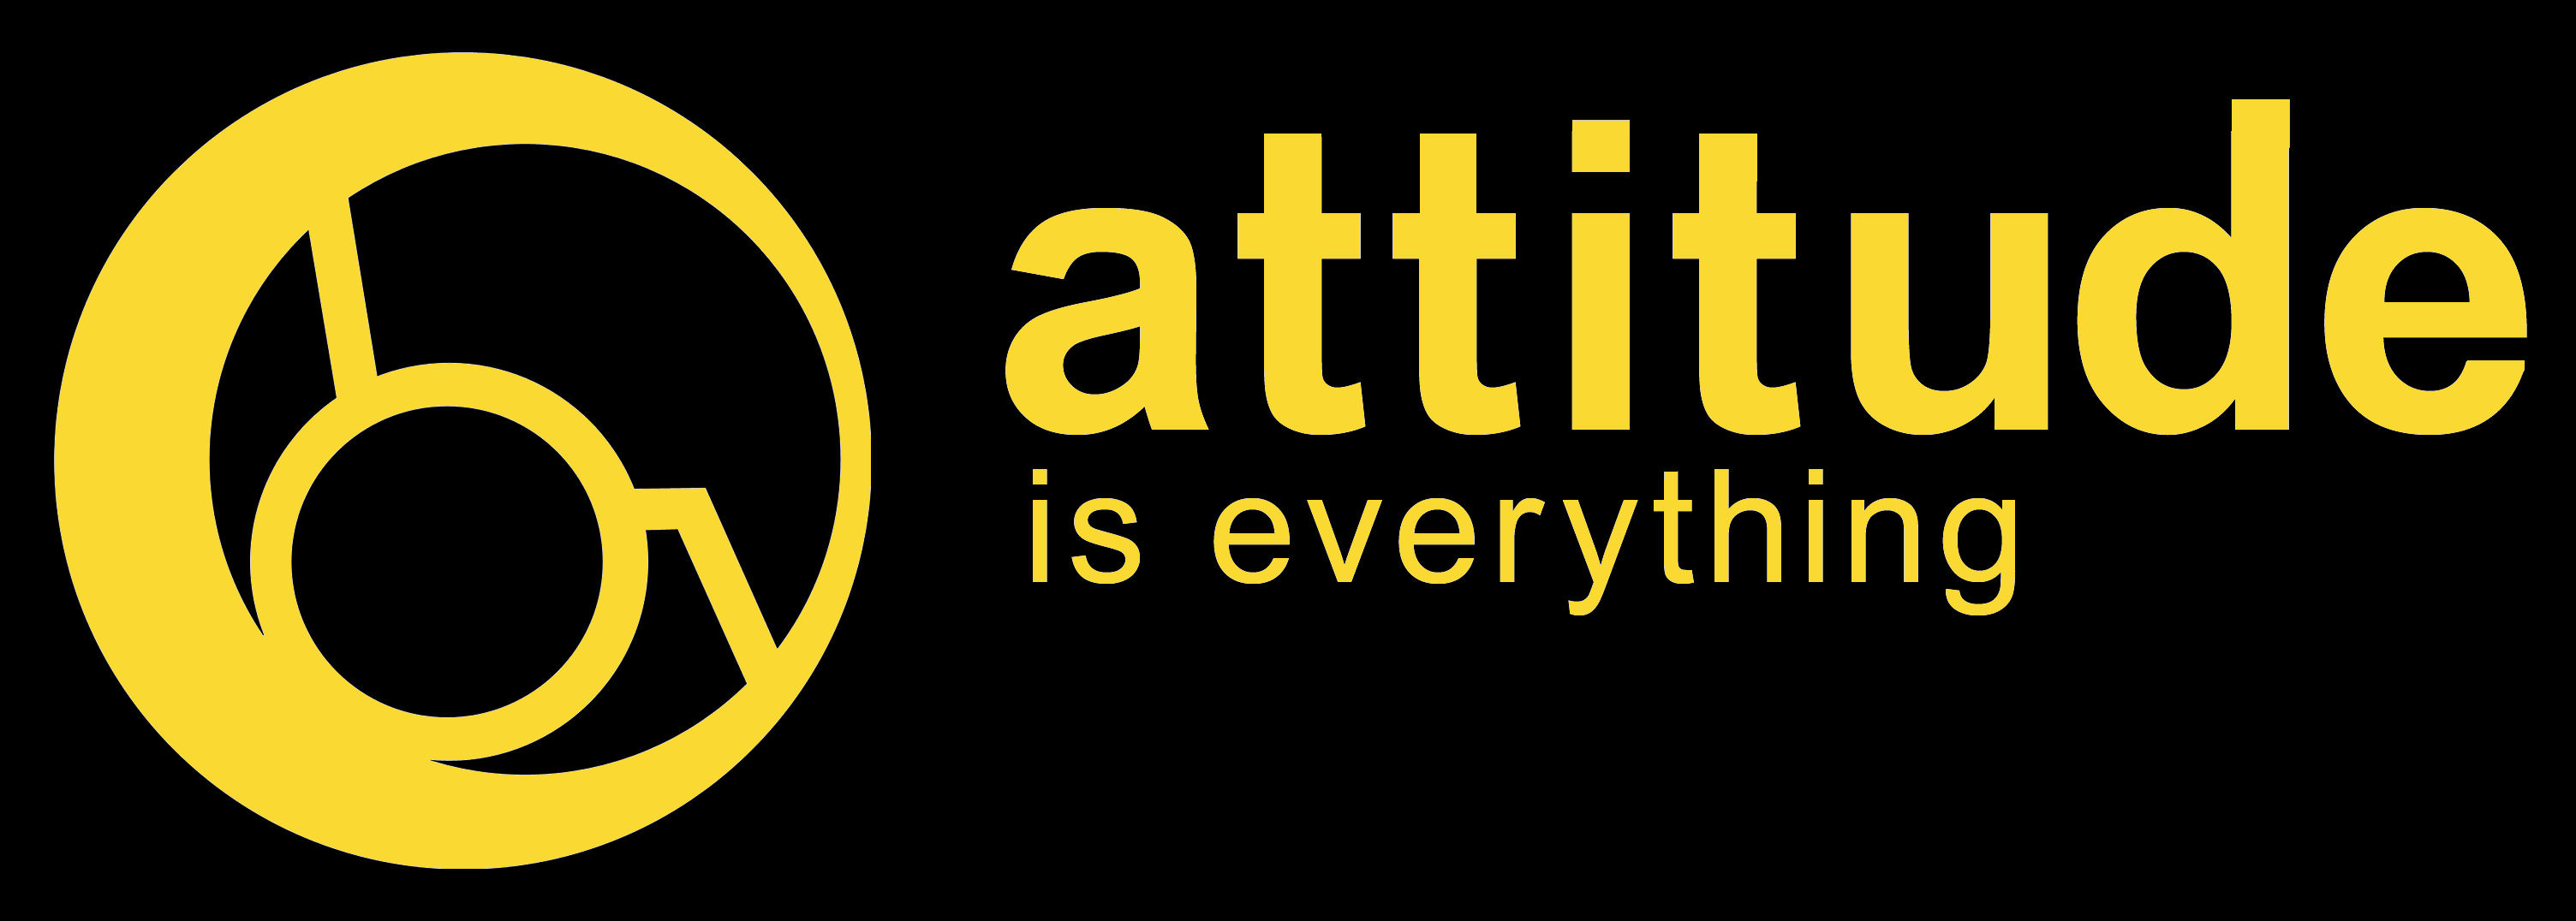 AiE_Logo_-_Yel_on_Blk_-_HR3